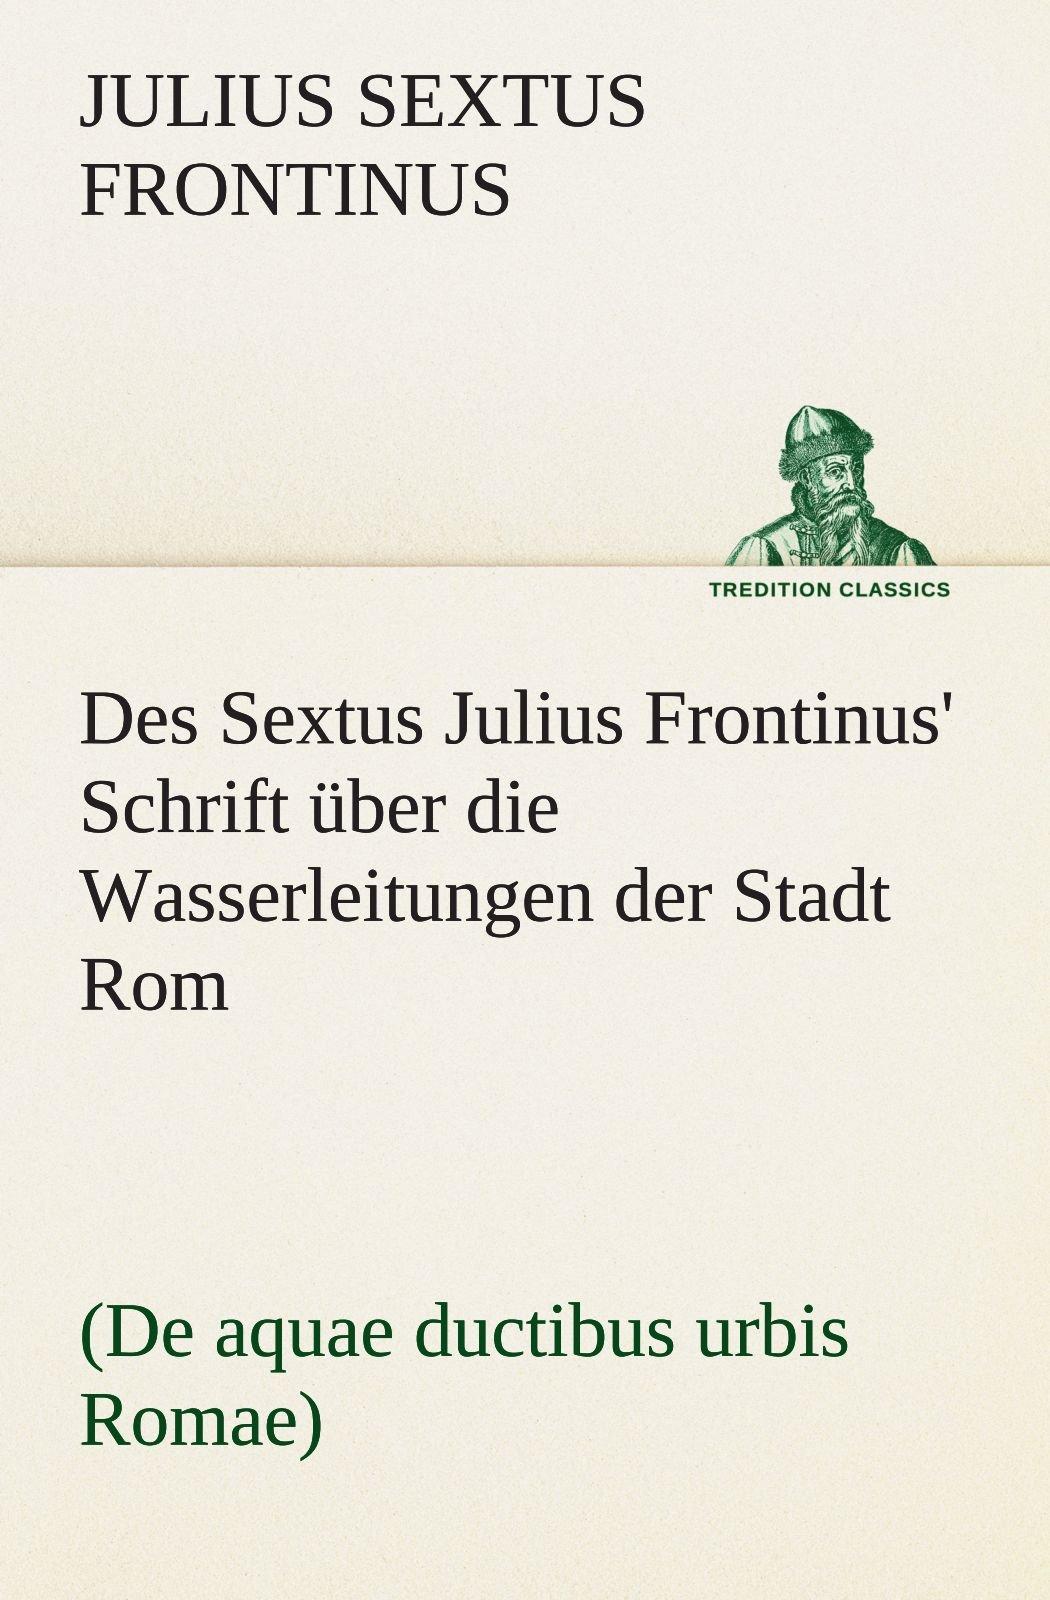 Des Sextus Julius Frontinus' Schrift über die Wasserleitungen der Stadt Rom: (De aquae ductibus urbis Romae) (TREDITION CLASSICS)